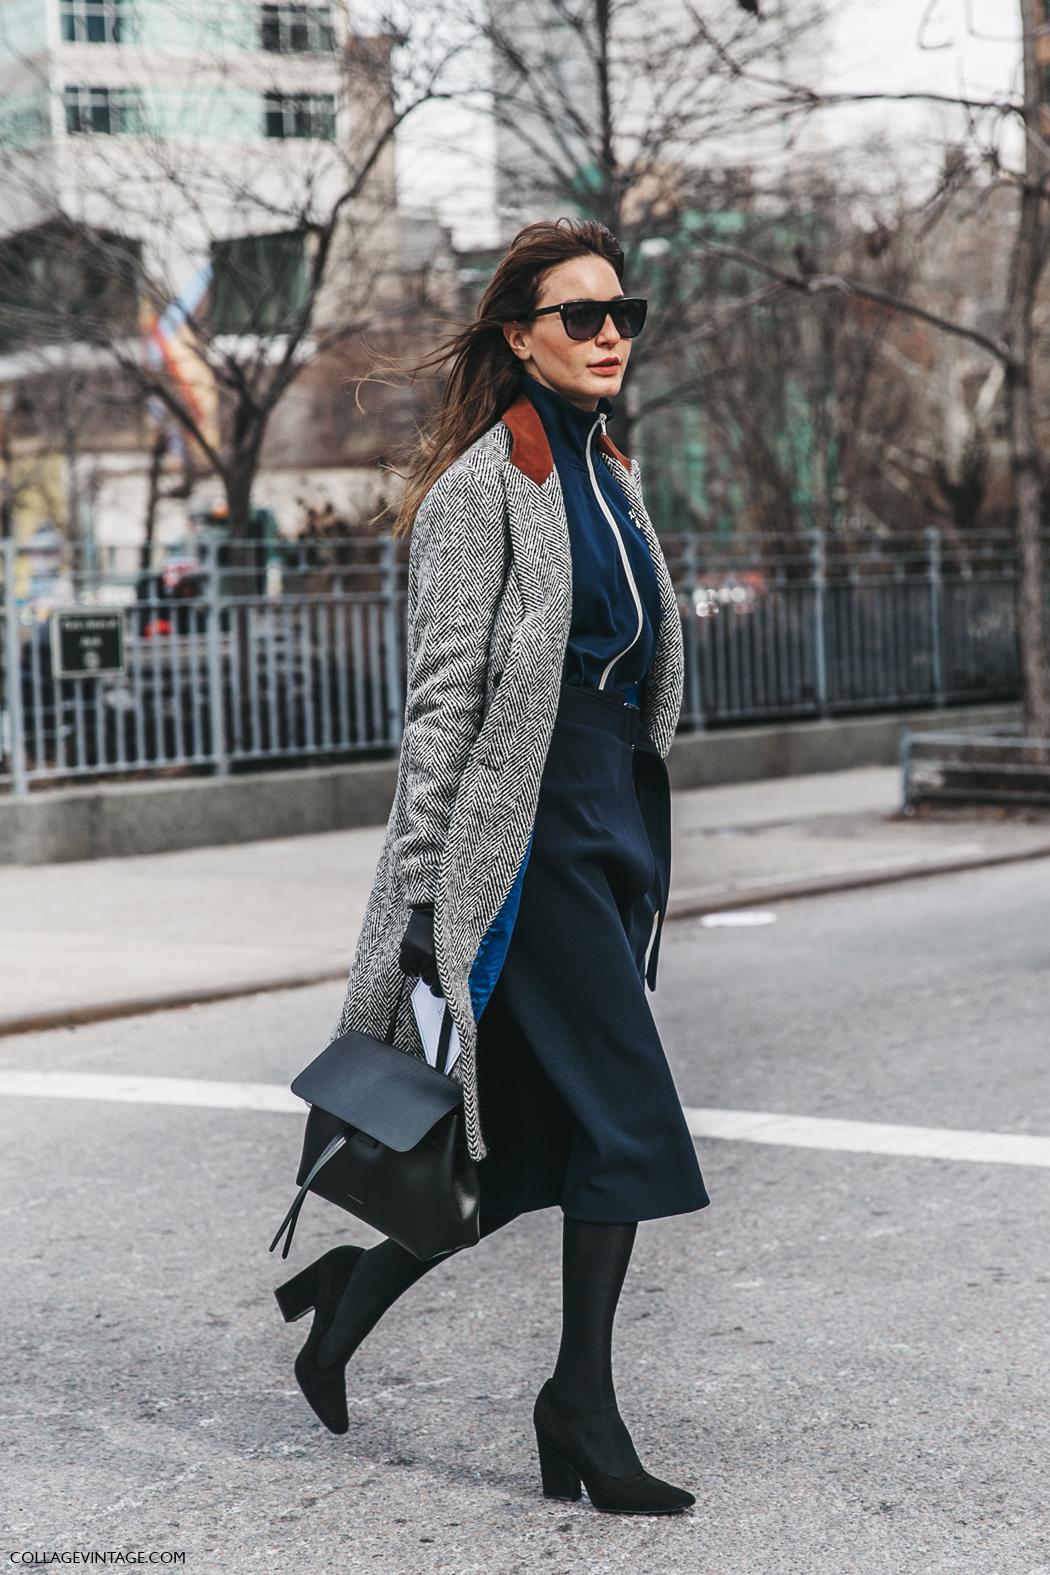 NYFW-New_York_Fashion_Week-Fall_Winter-17-Street_Style-Ece_Sukan-